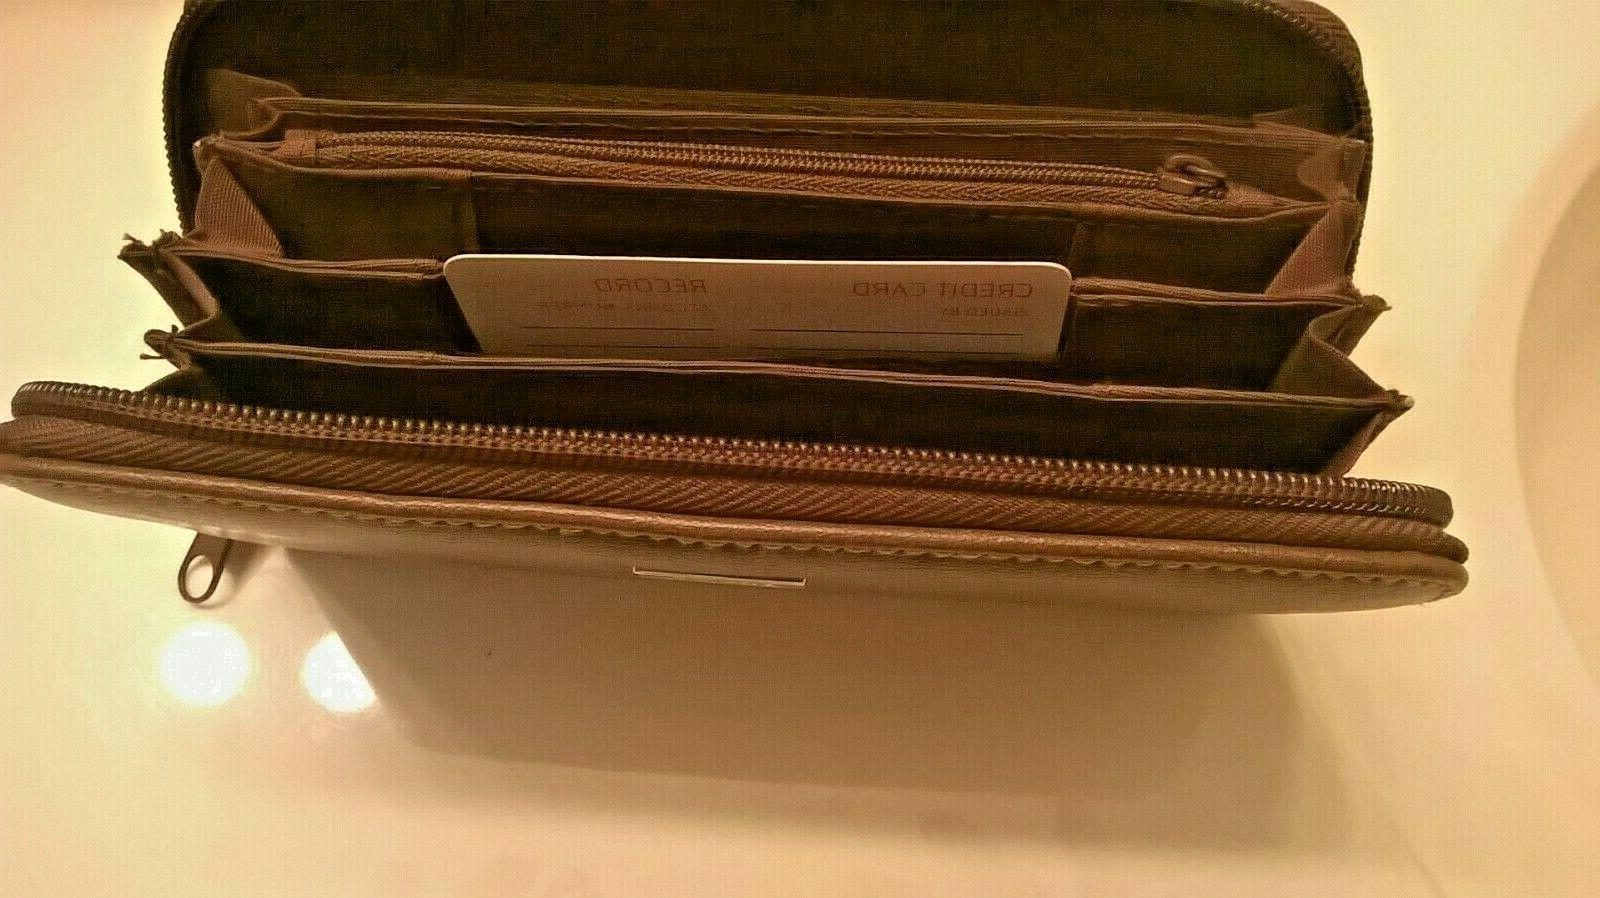 Rosetti Wallet Coupons, Checkbook, Debt